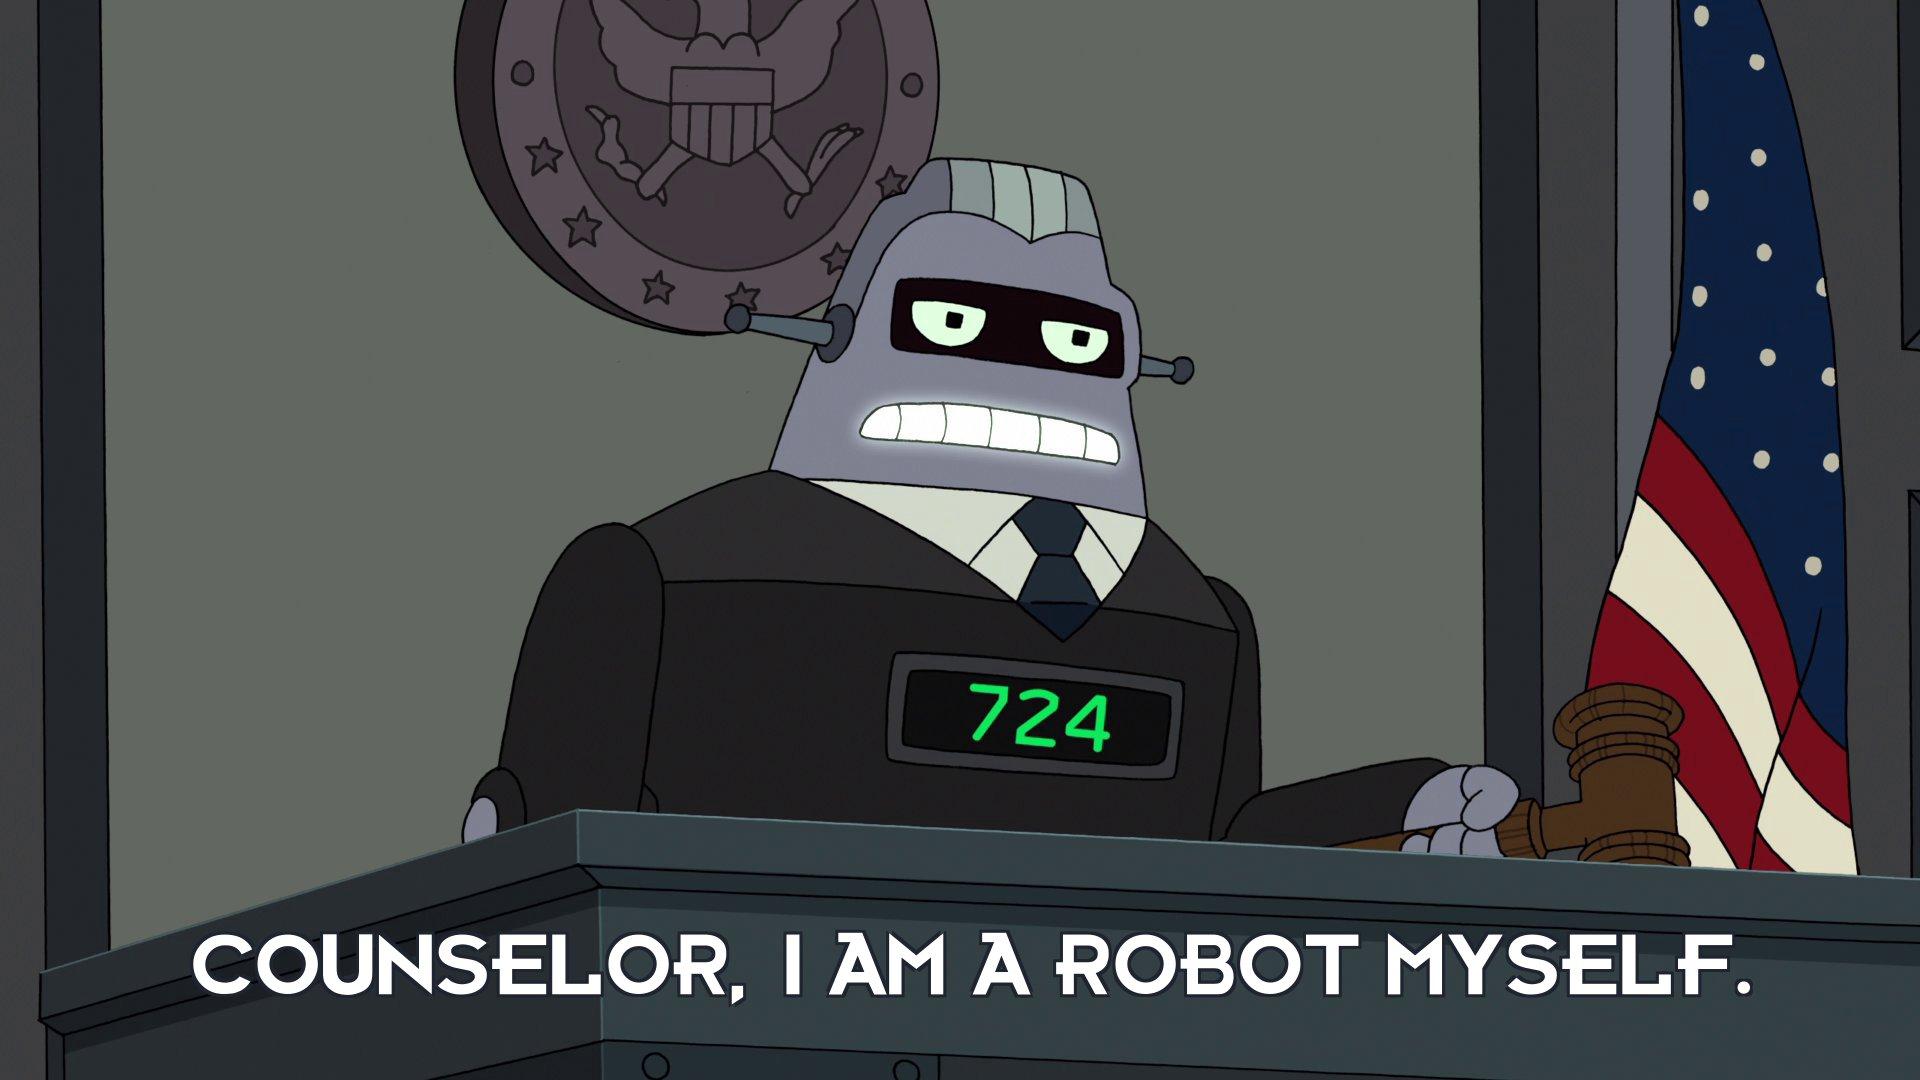 Judge 724: Counselor, I am a robot myself.